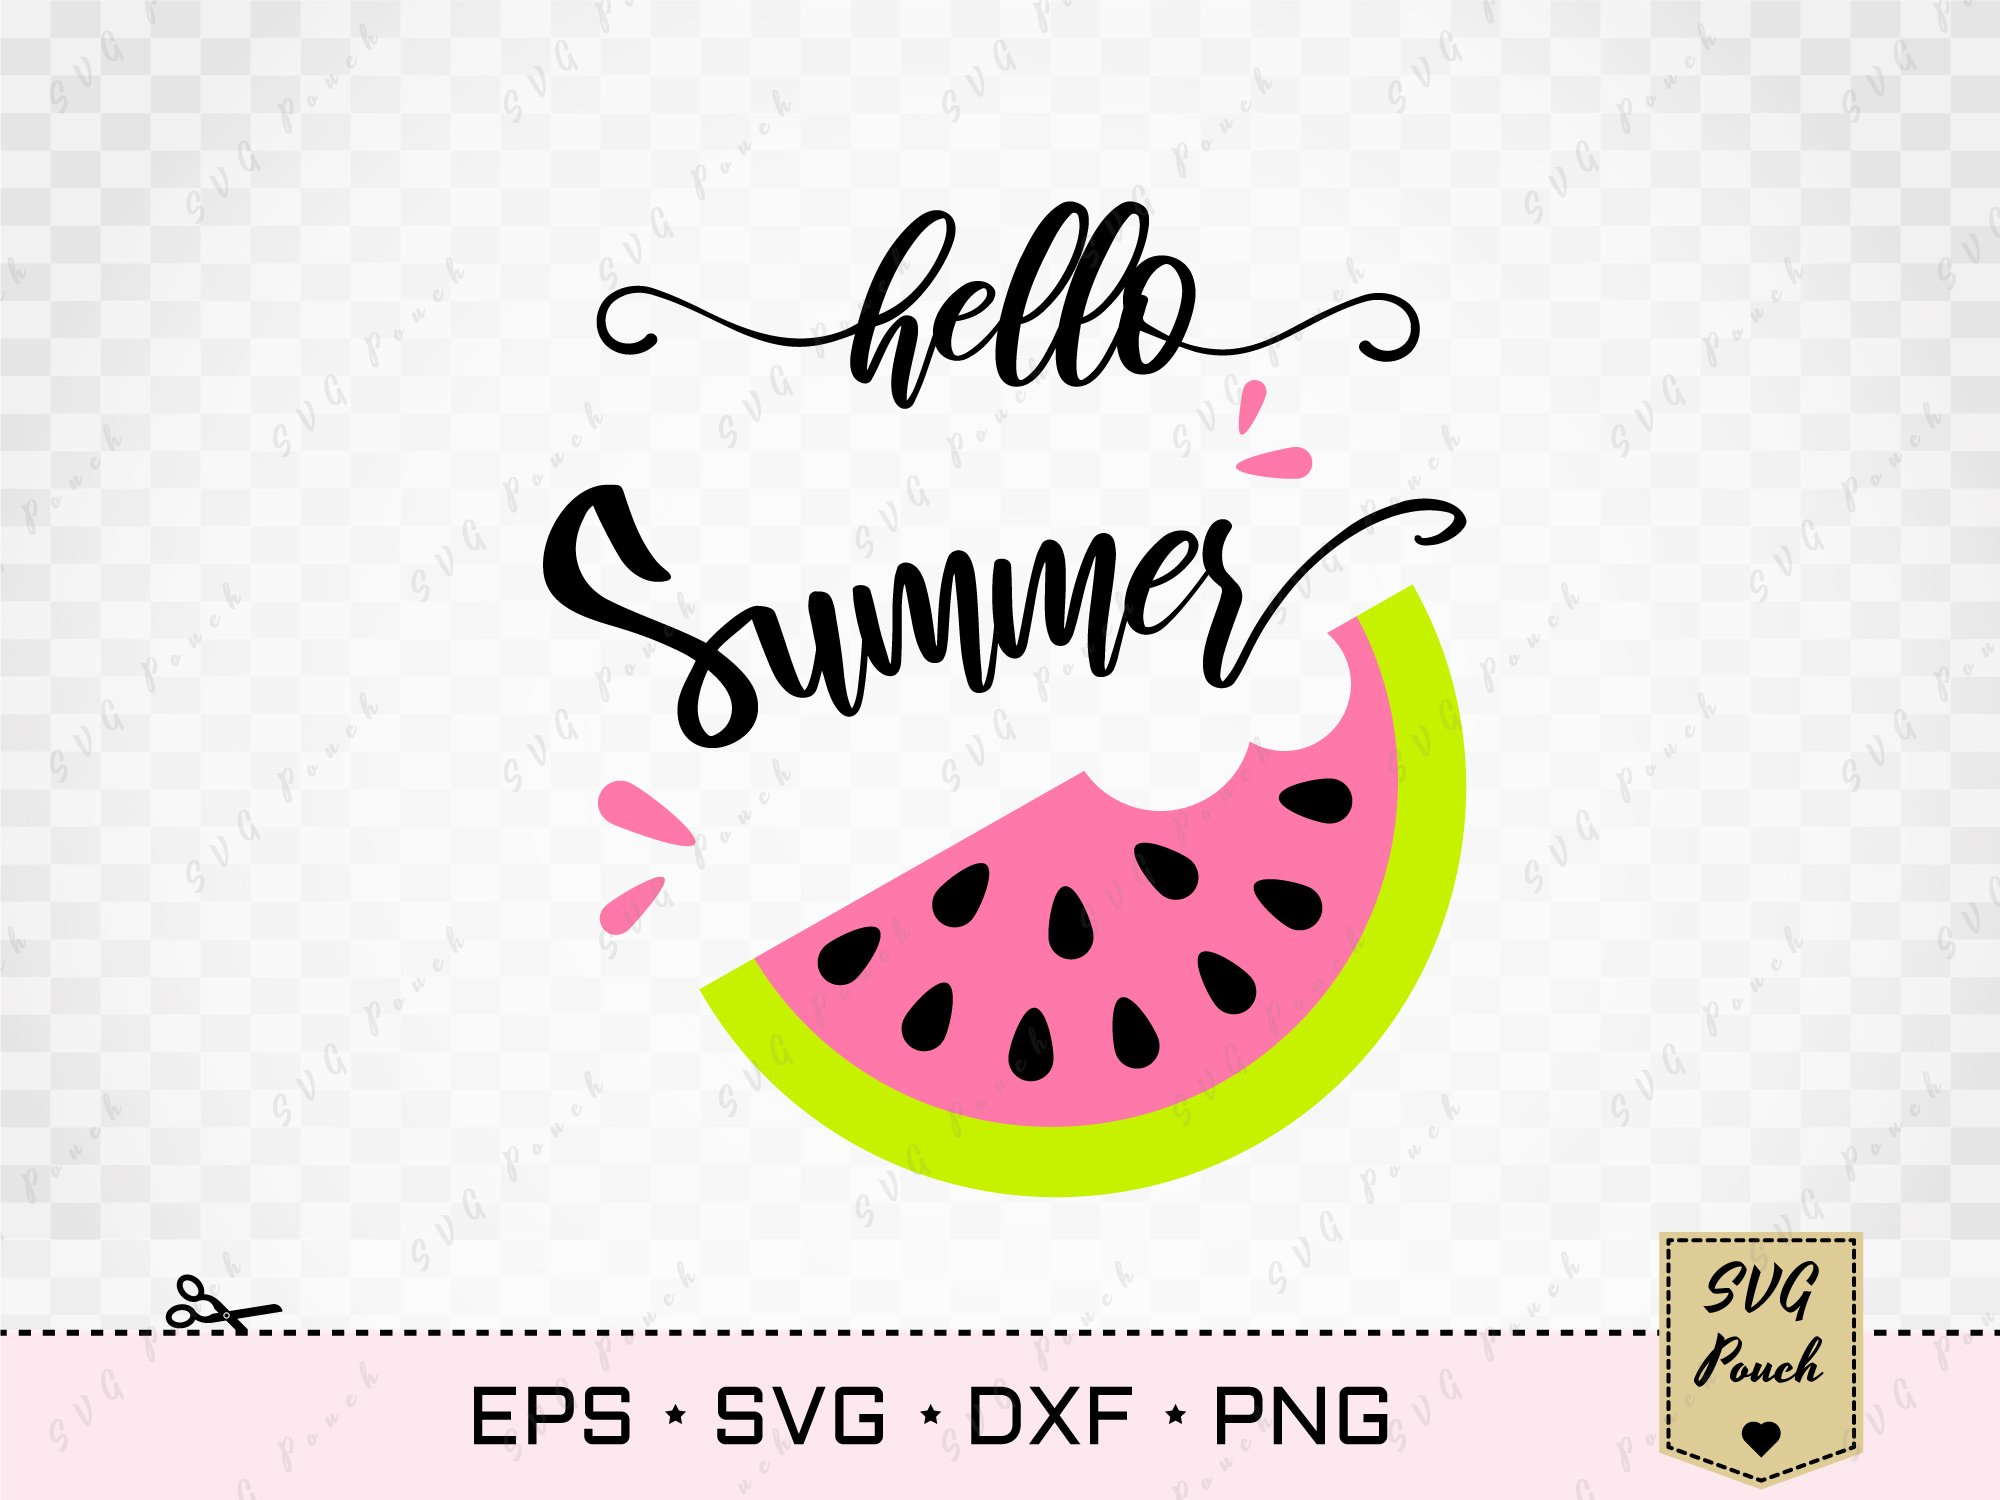 Download Hello Summer Svg Cut File Ò Watermelon Ò Silhouette Ò Cricut Crafter Files